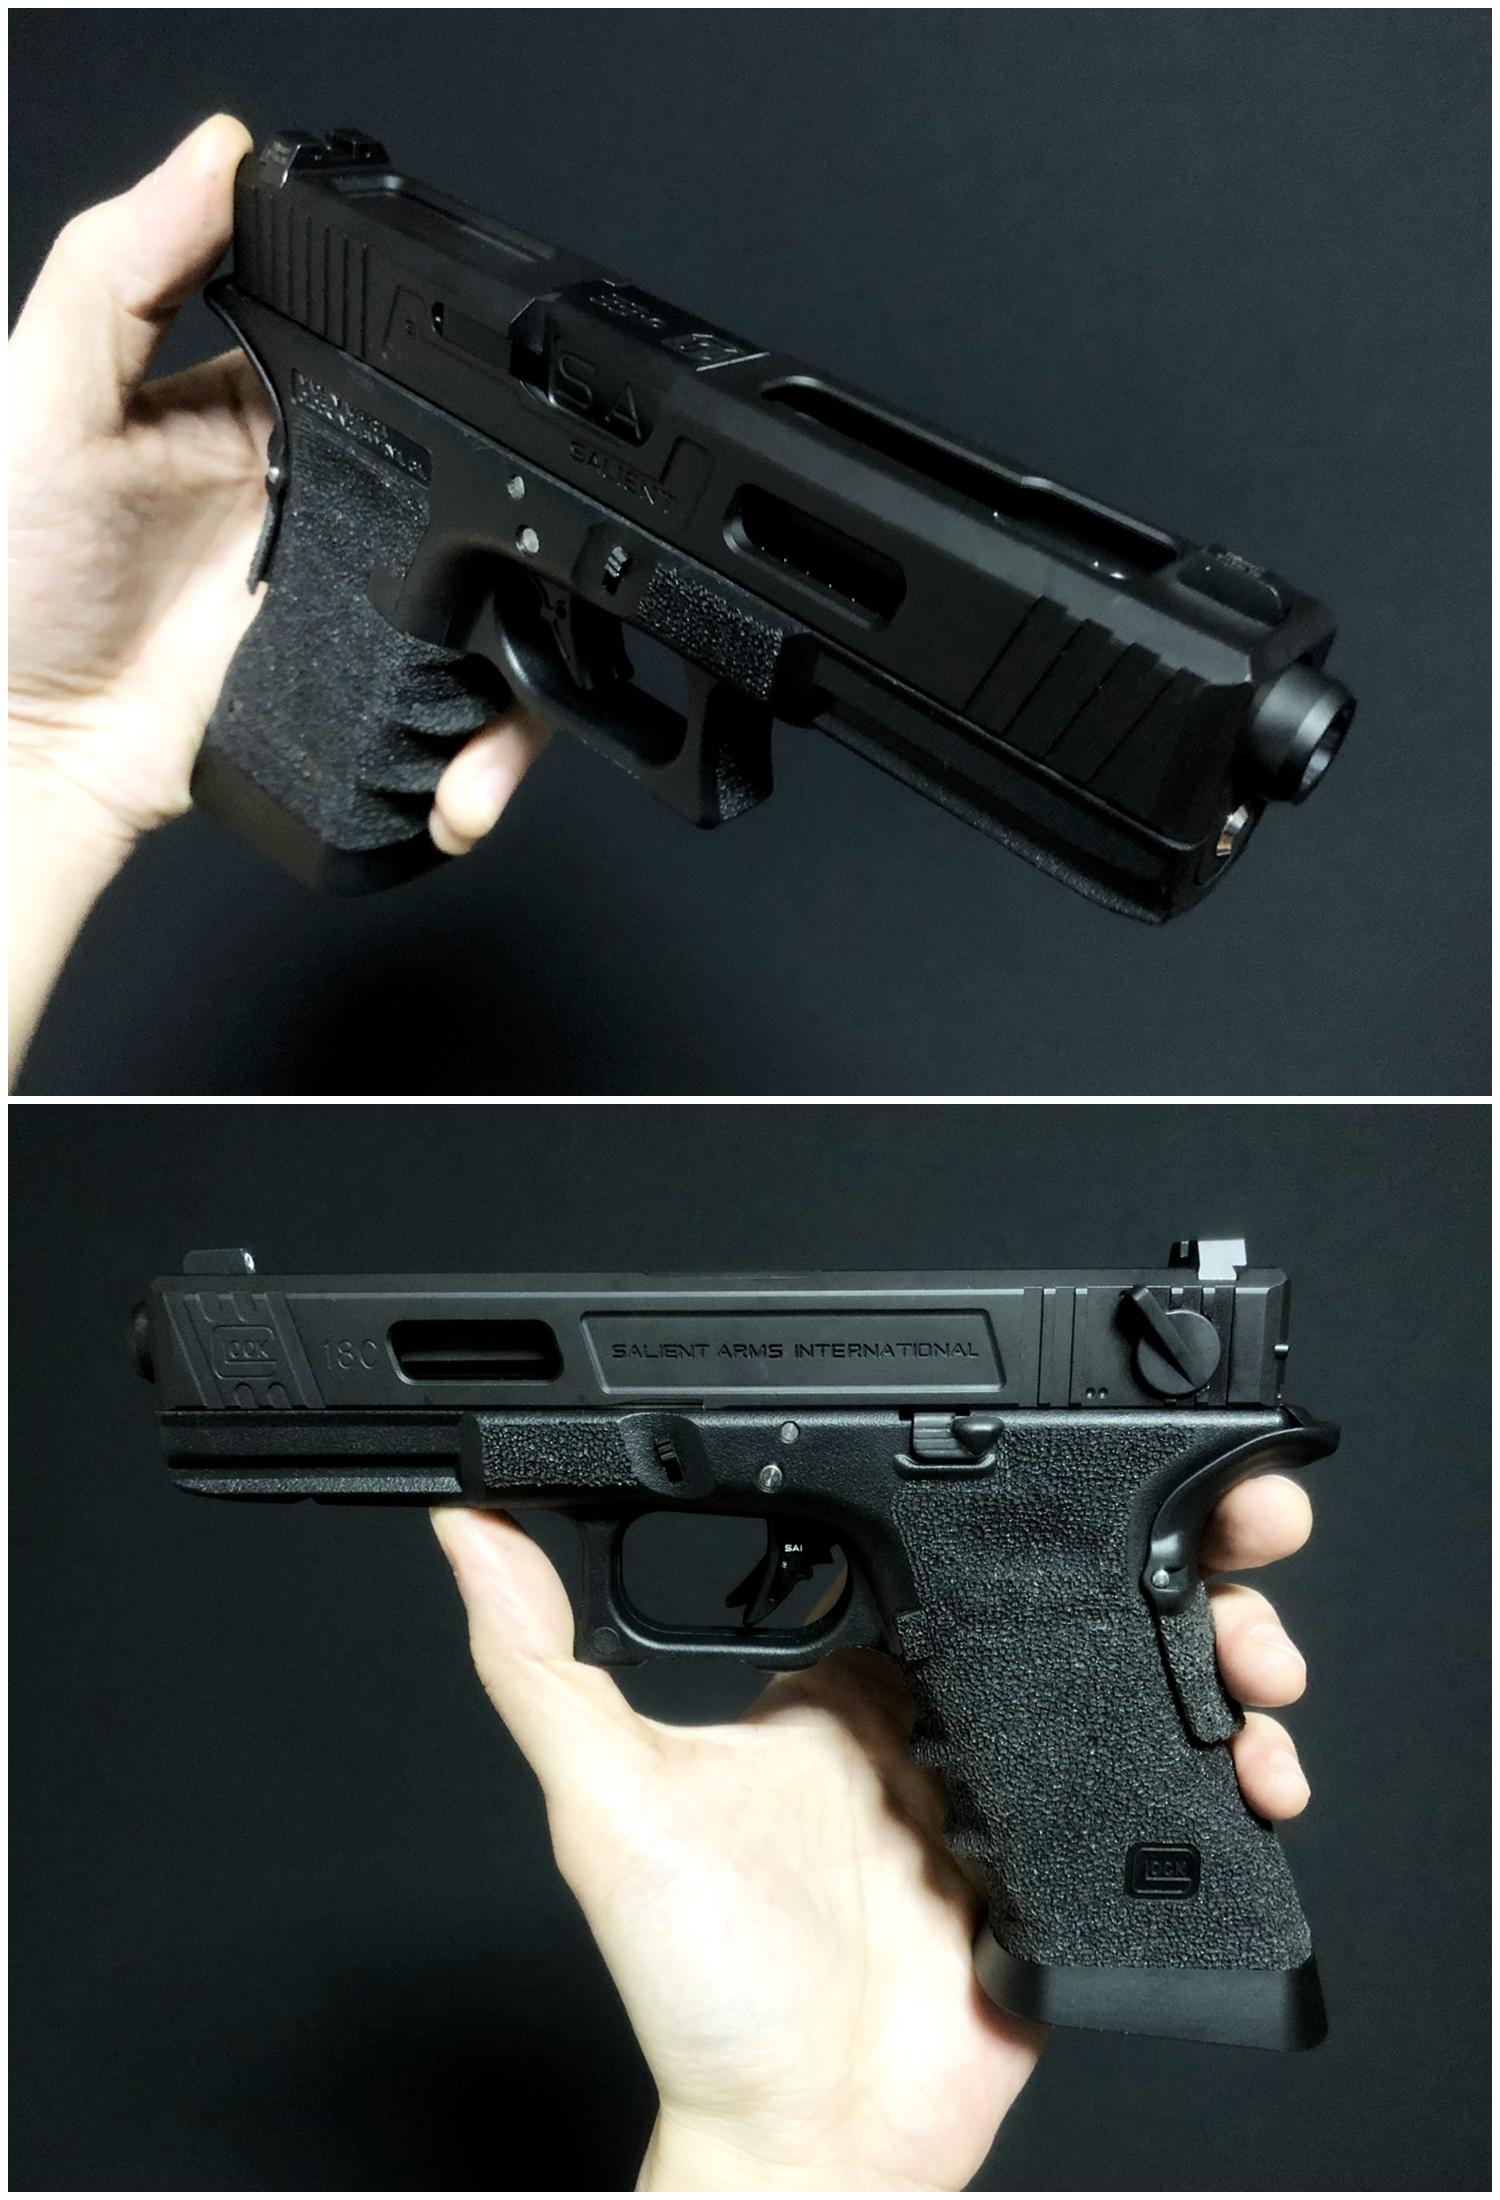 77 GLOCK Trijicon TRITIUM NIGHT SIGHTS HD HI LOW Guns Modify!! グロック トリジコン トリチウム サイト GET!! 購入 検証 取付 レビュー!! したるの巻!!